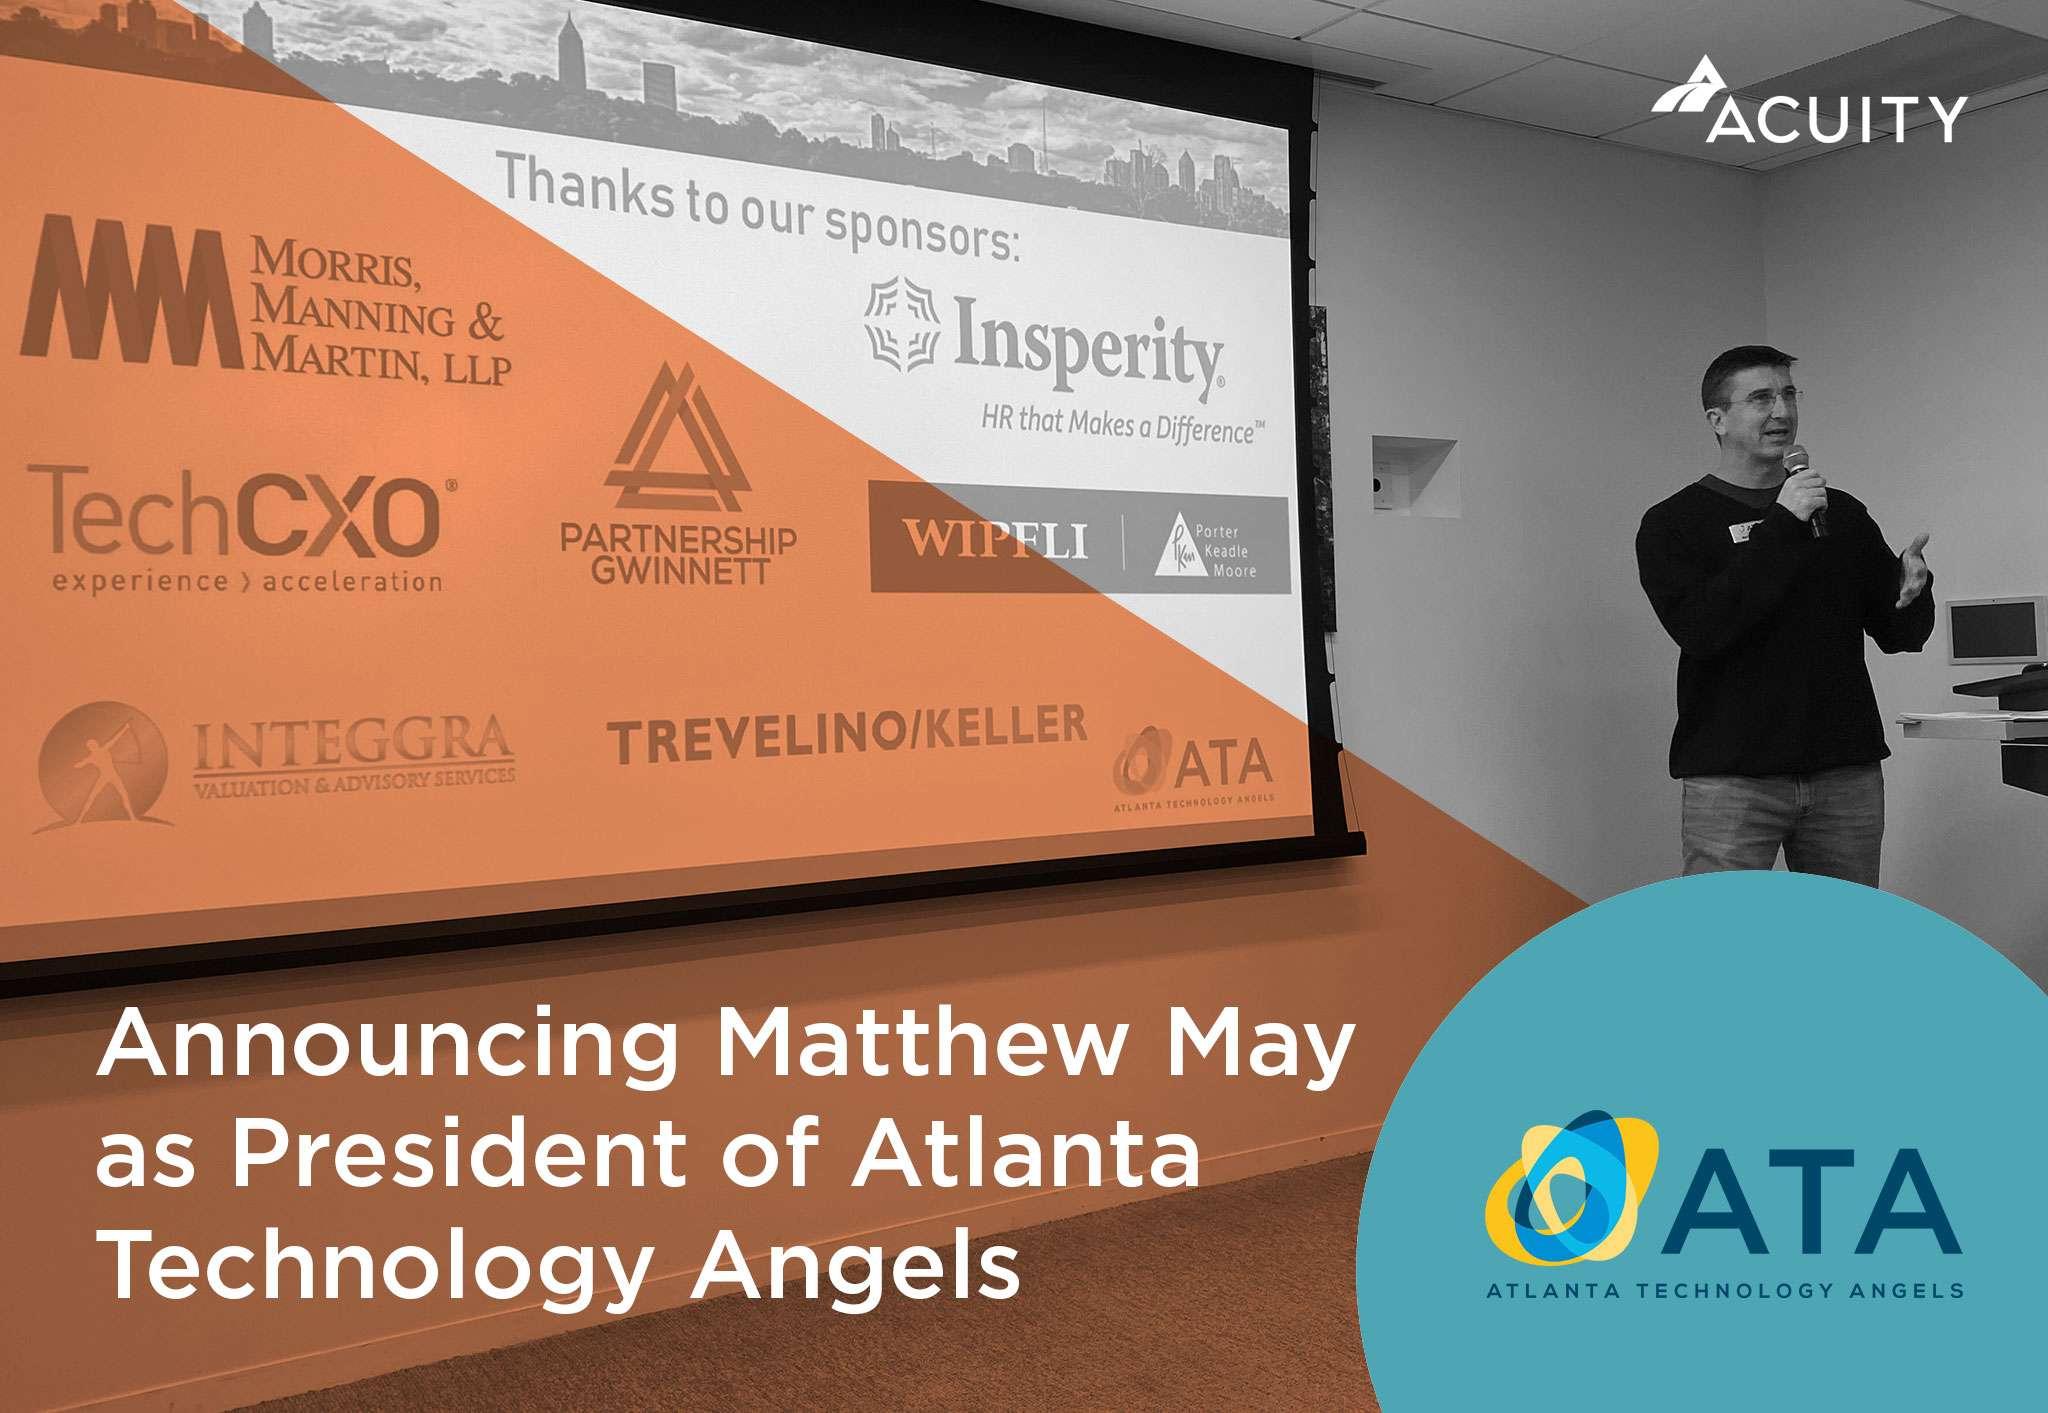 Atlanta Technology Angels